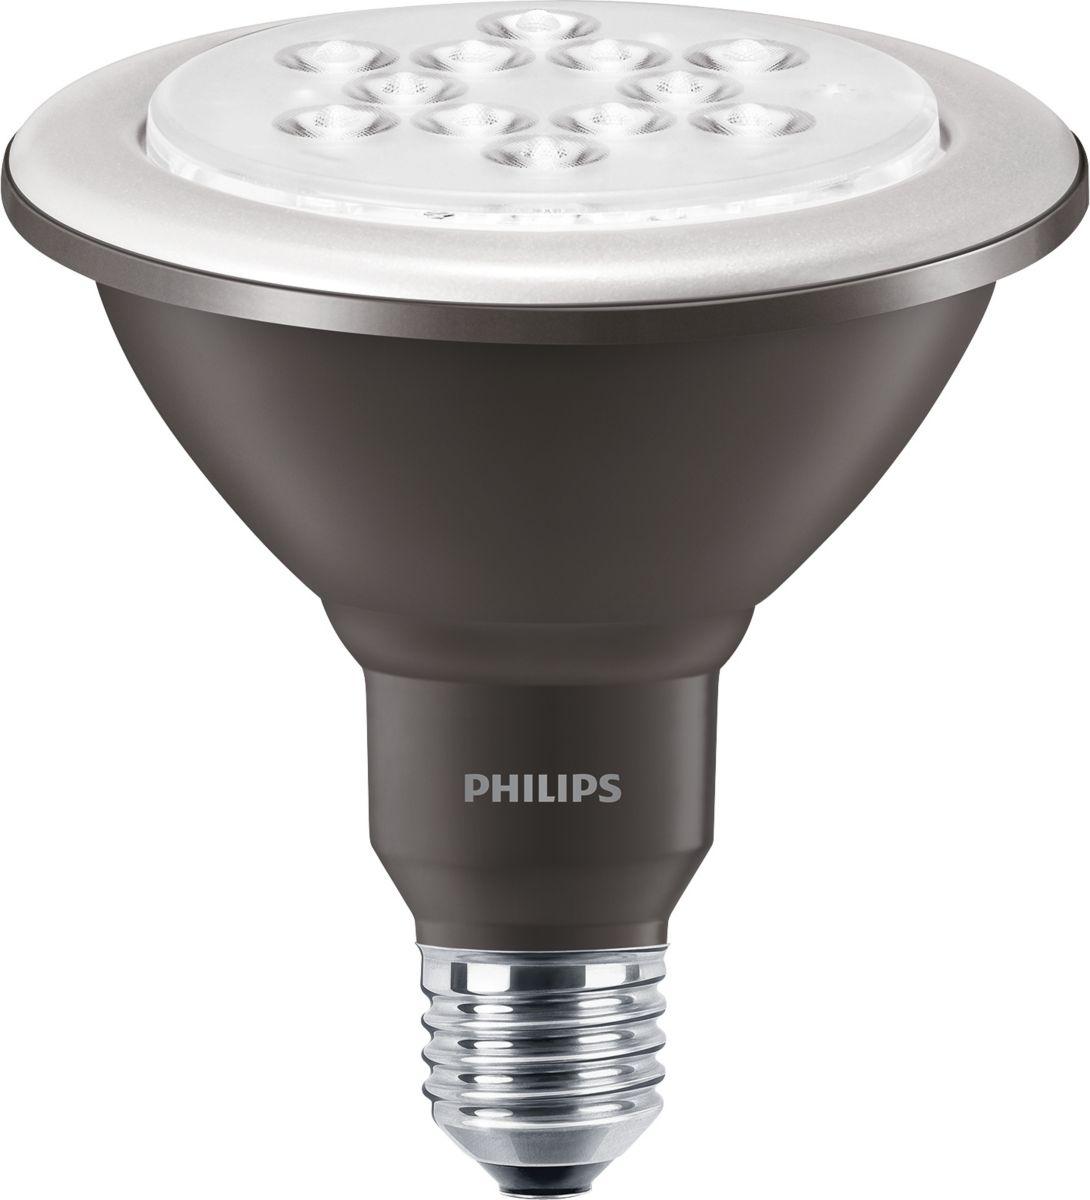 MASTER LEDspot PAR LED spots Philips Lighting